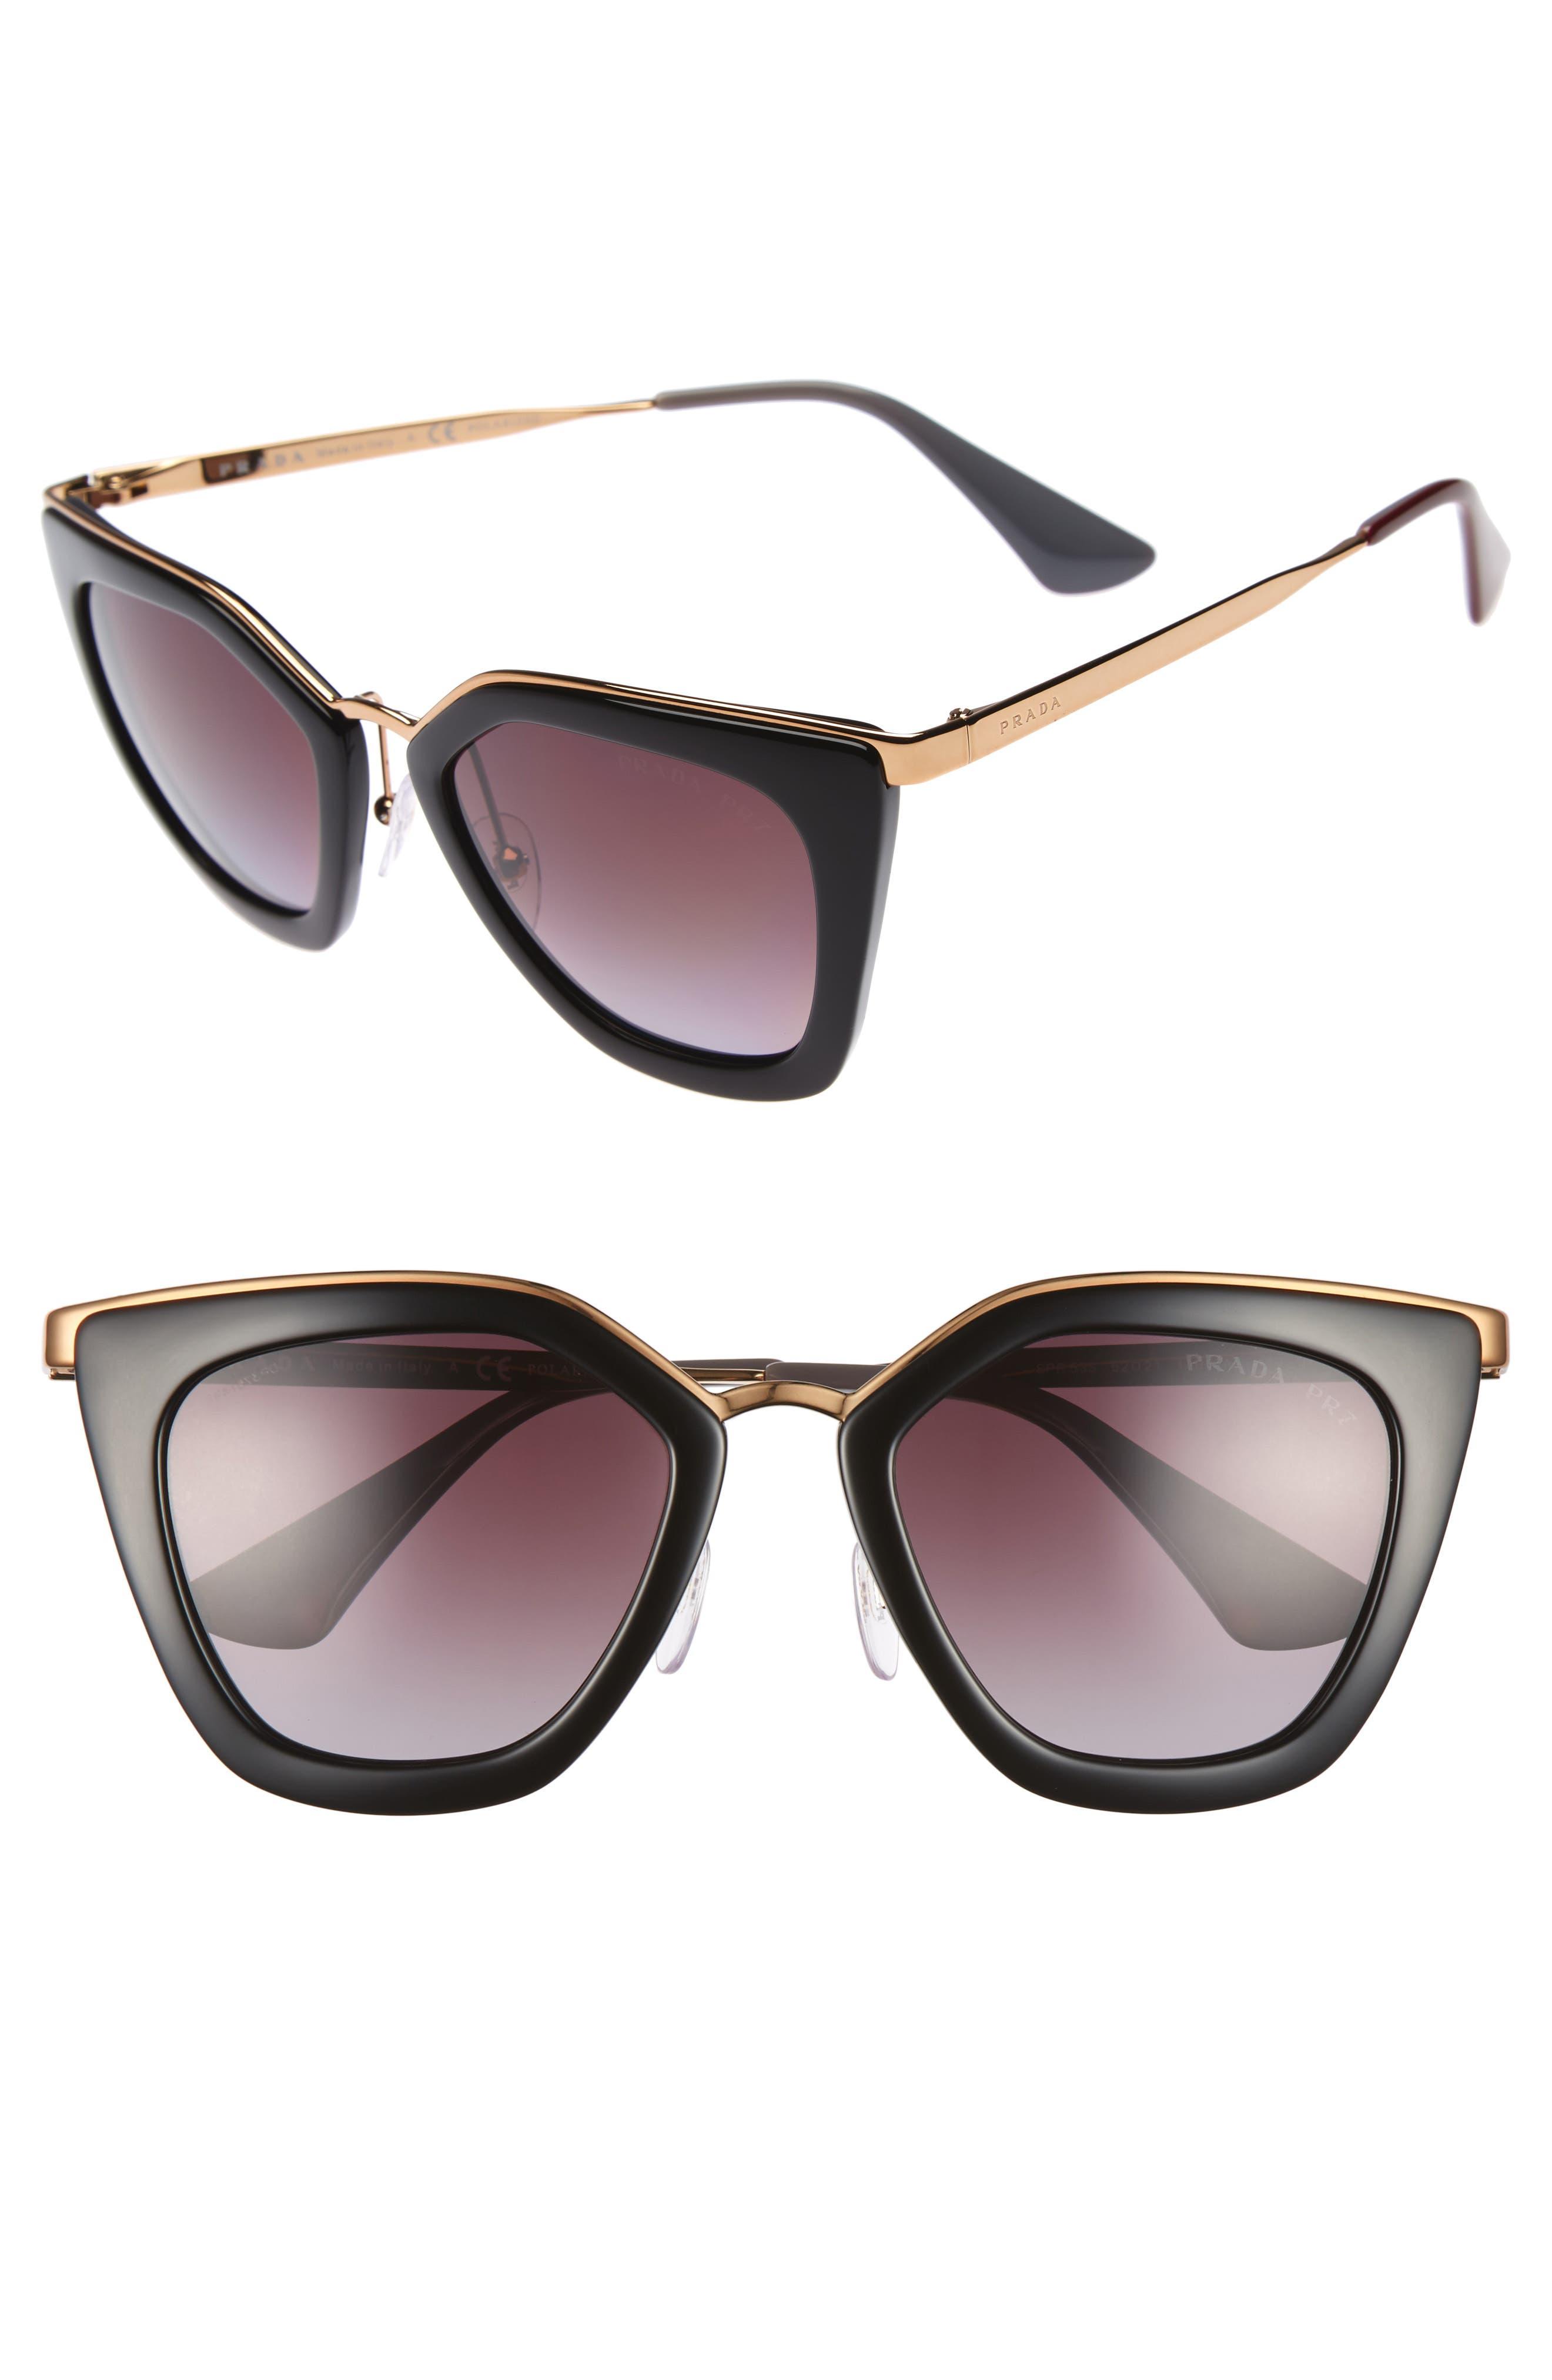 Main Image - Prada 52mm Polarized Cat Eye Sunglasses